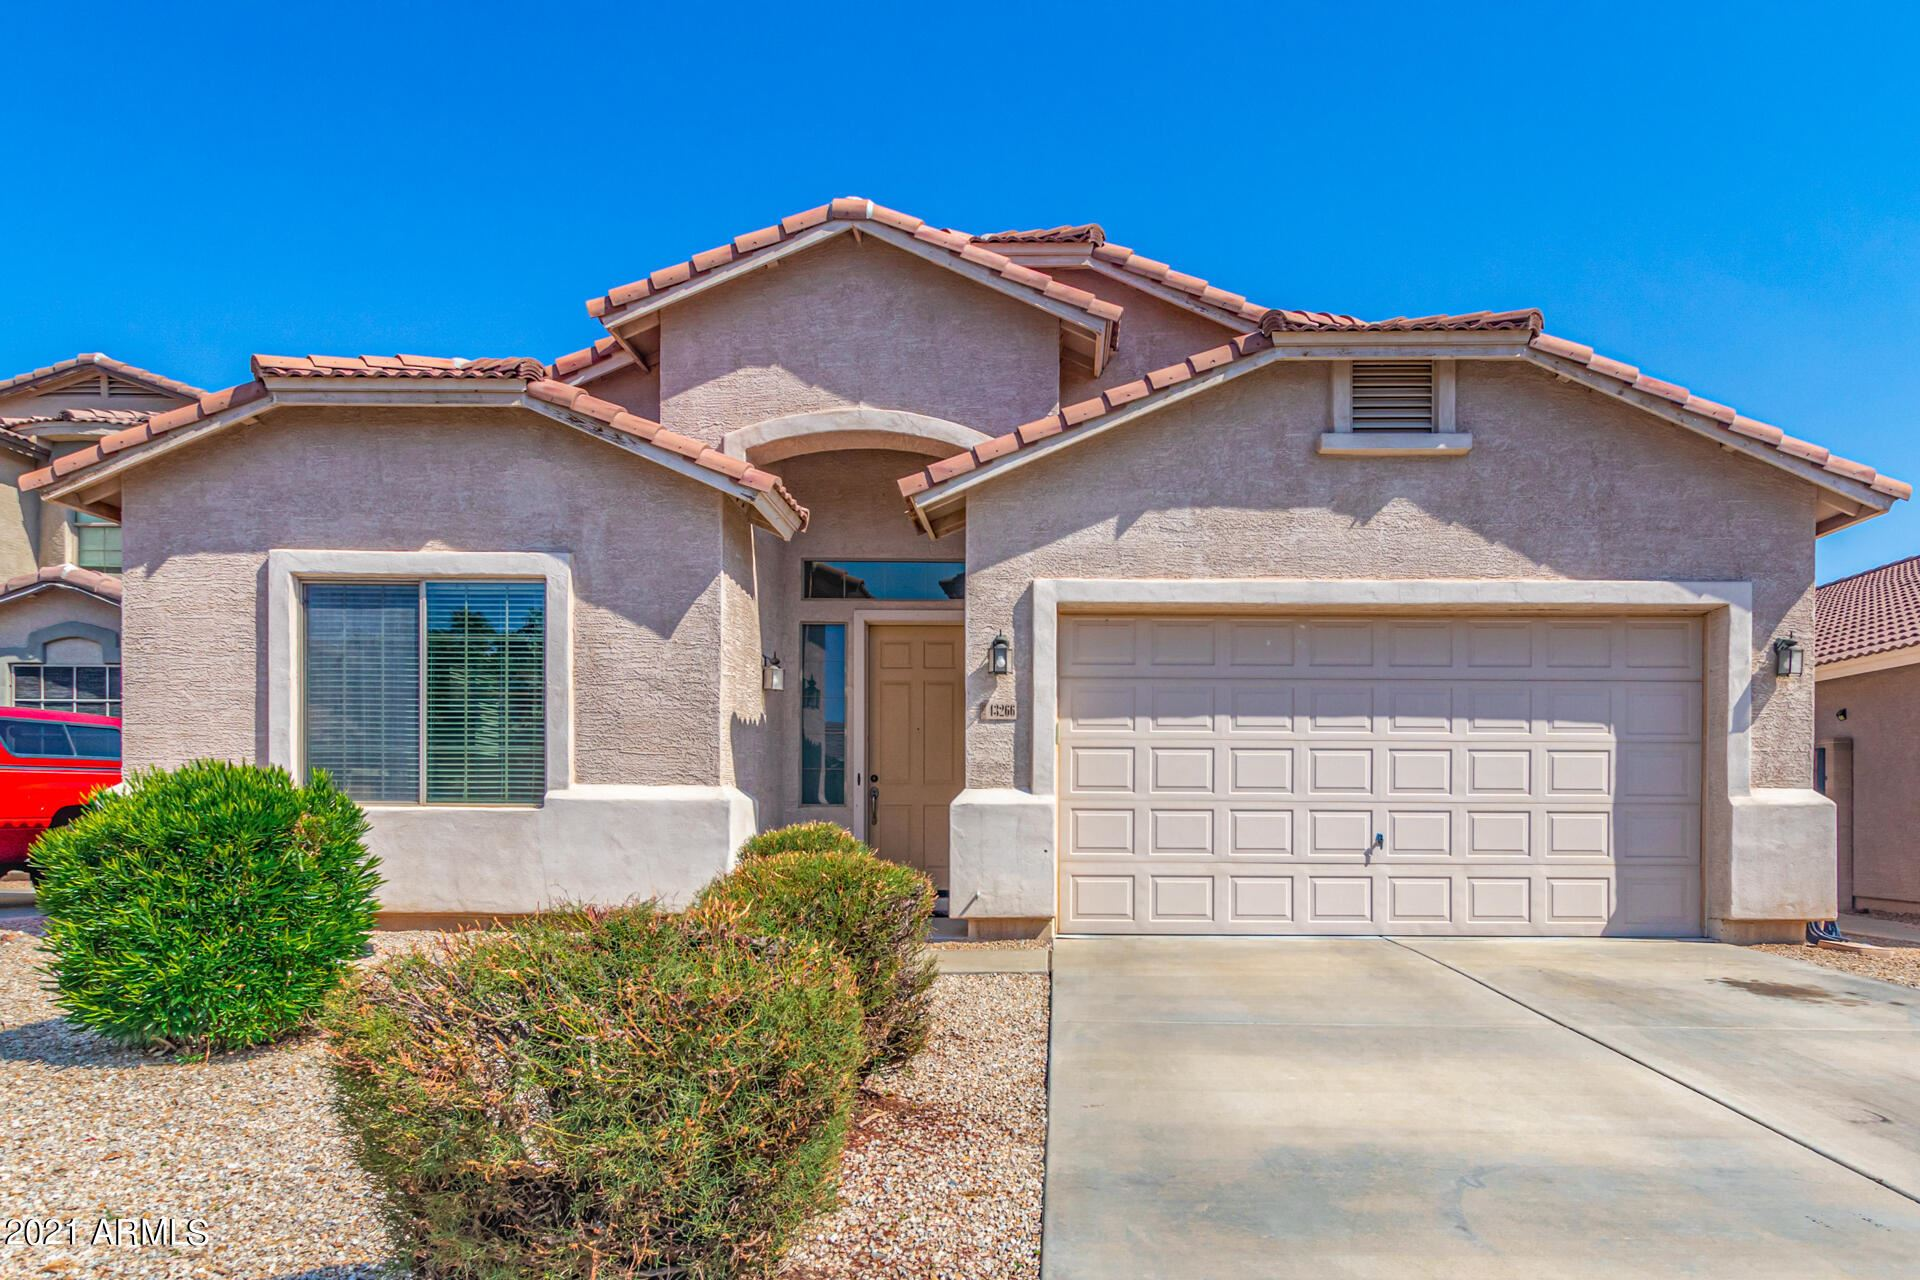 Photo for 43266 W MICHAELS Drive, Maricopa, AZ 85138 (MLS # 6277683)